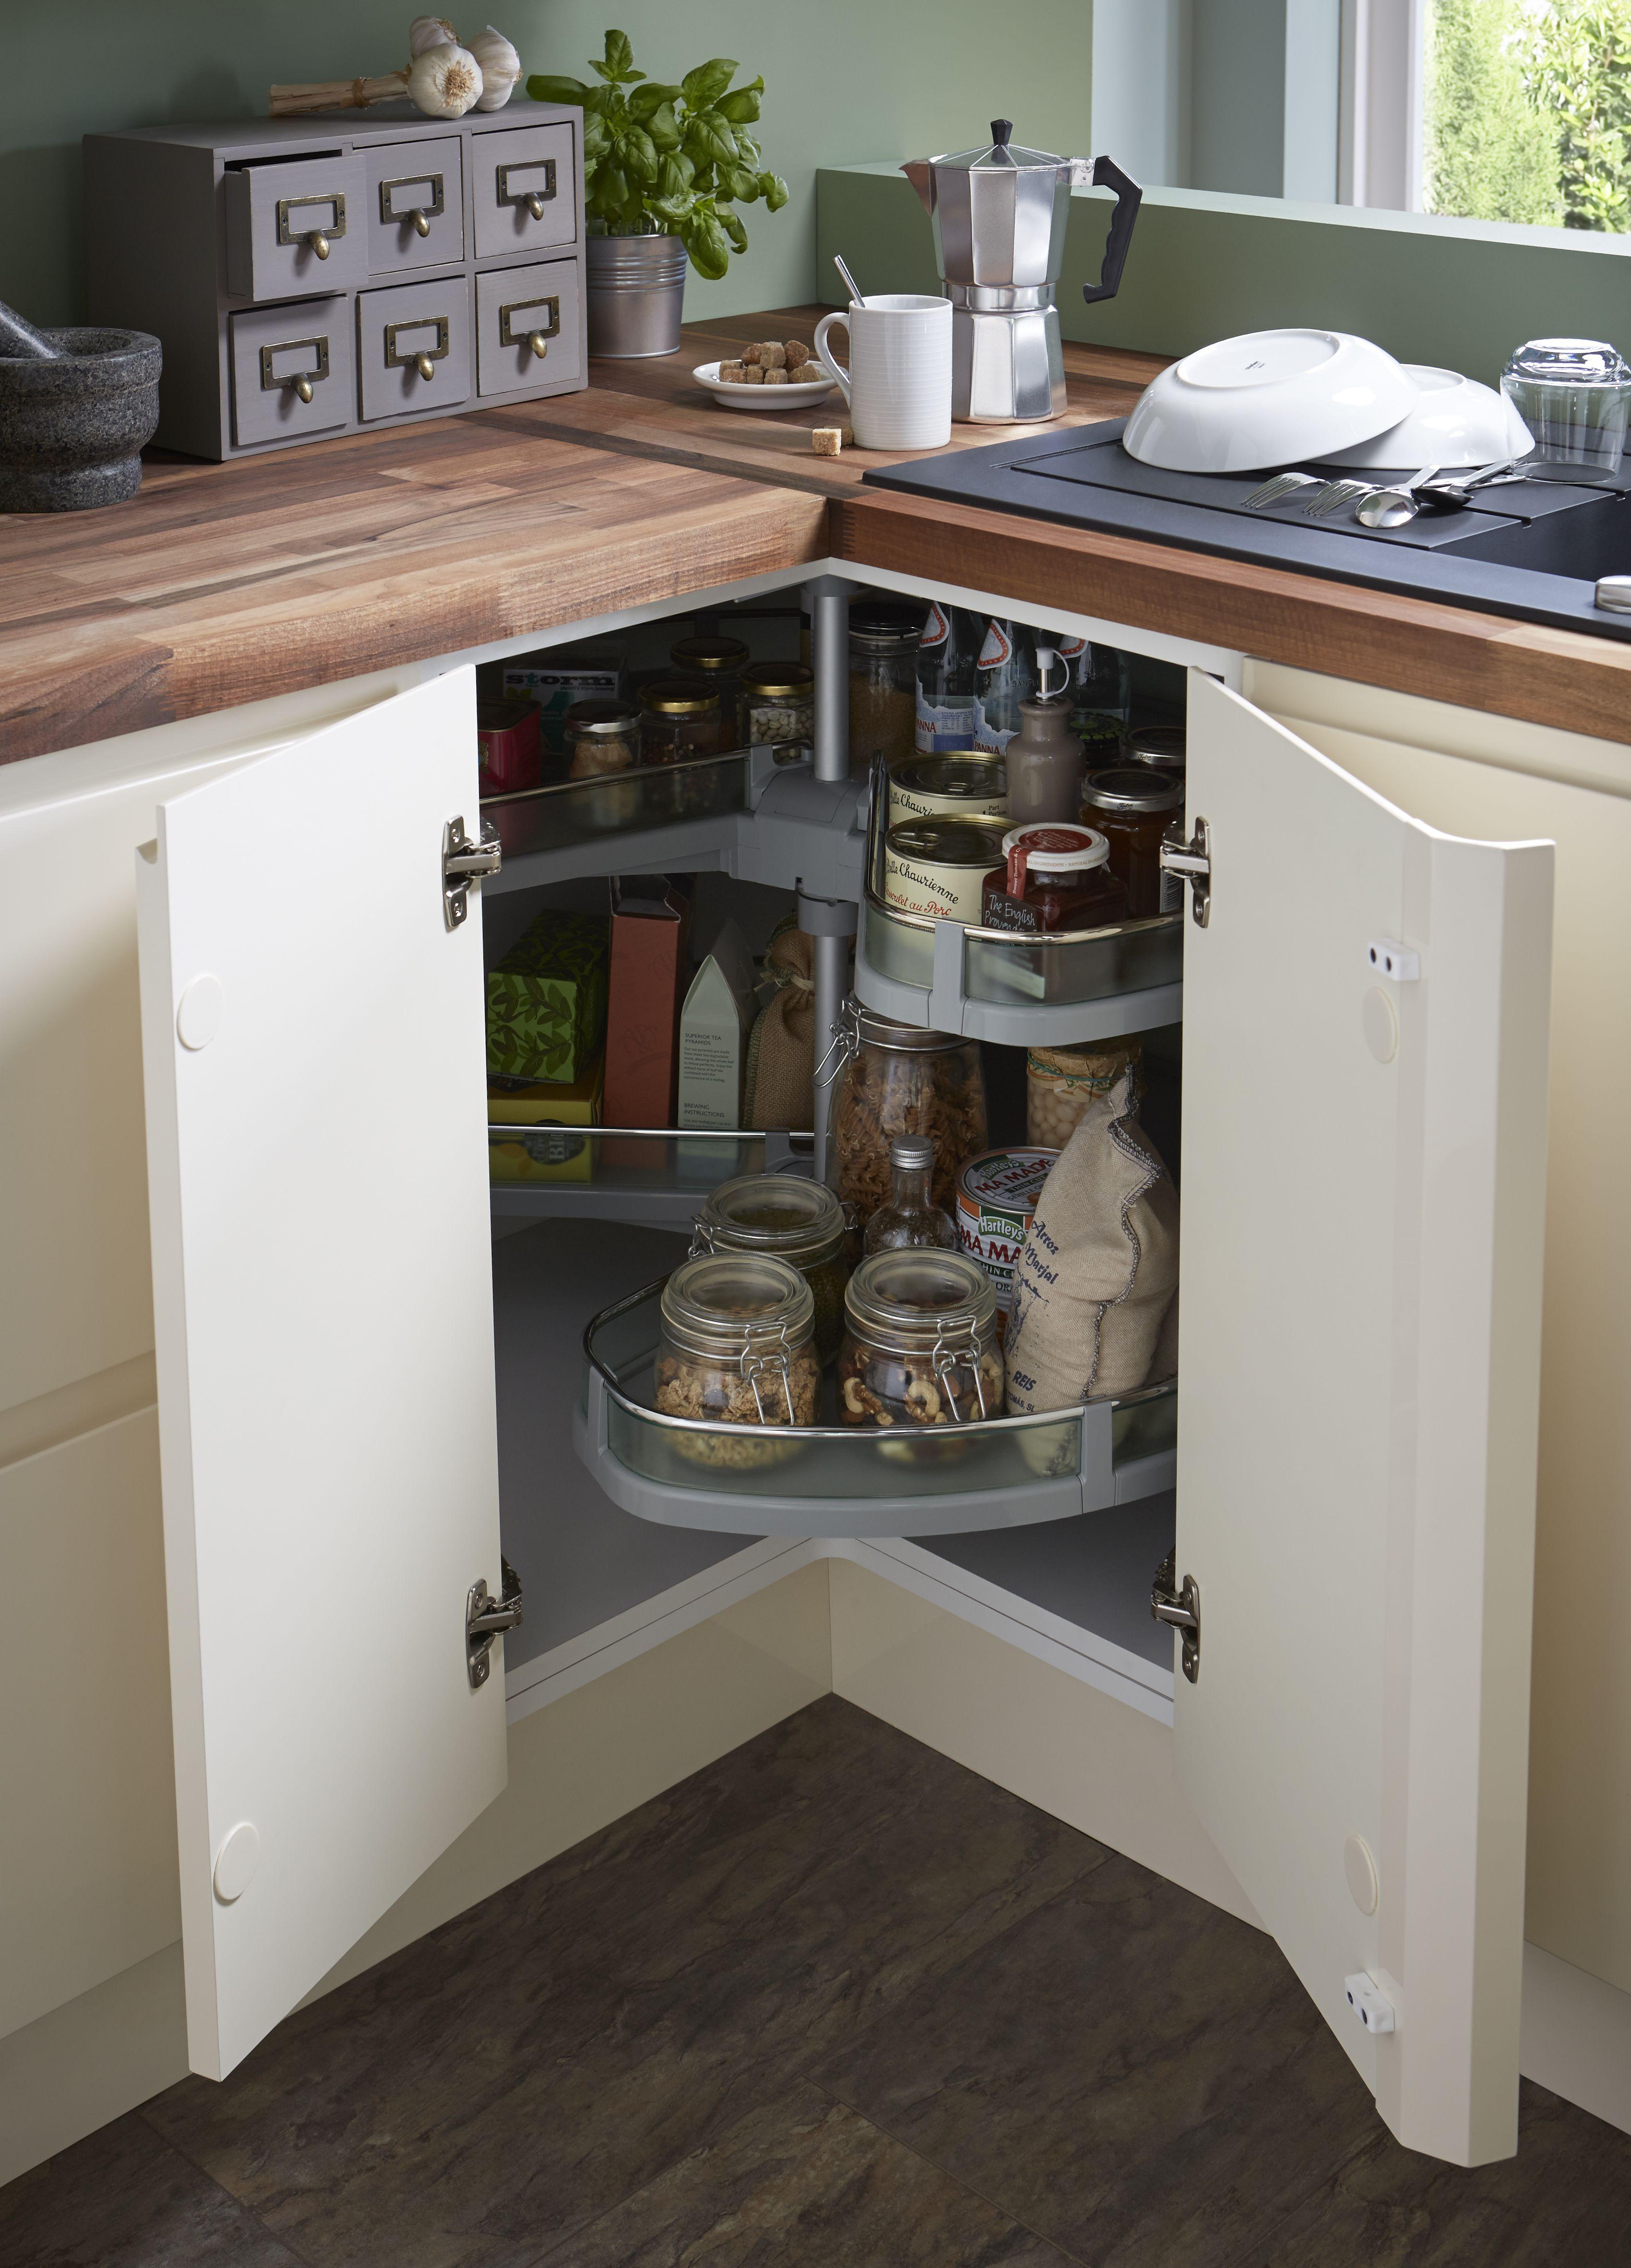 superior Kitchen Cabinet Carousel #7: Kitchen Corner Carousel Cabinet How To Teach Sink